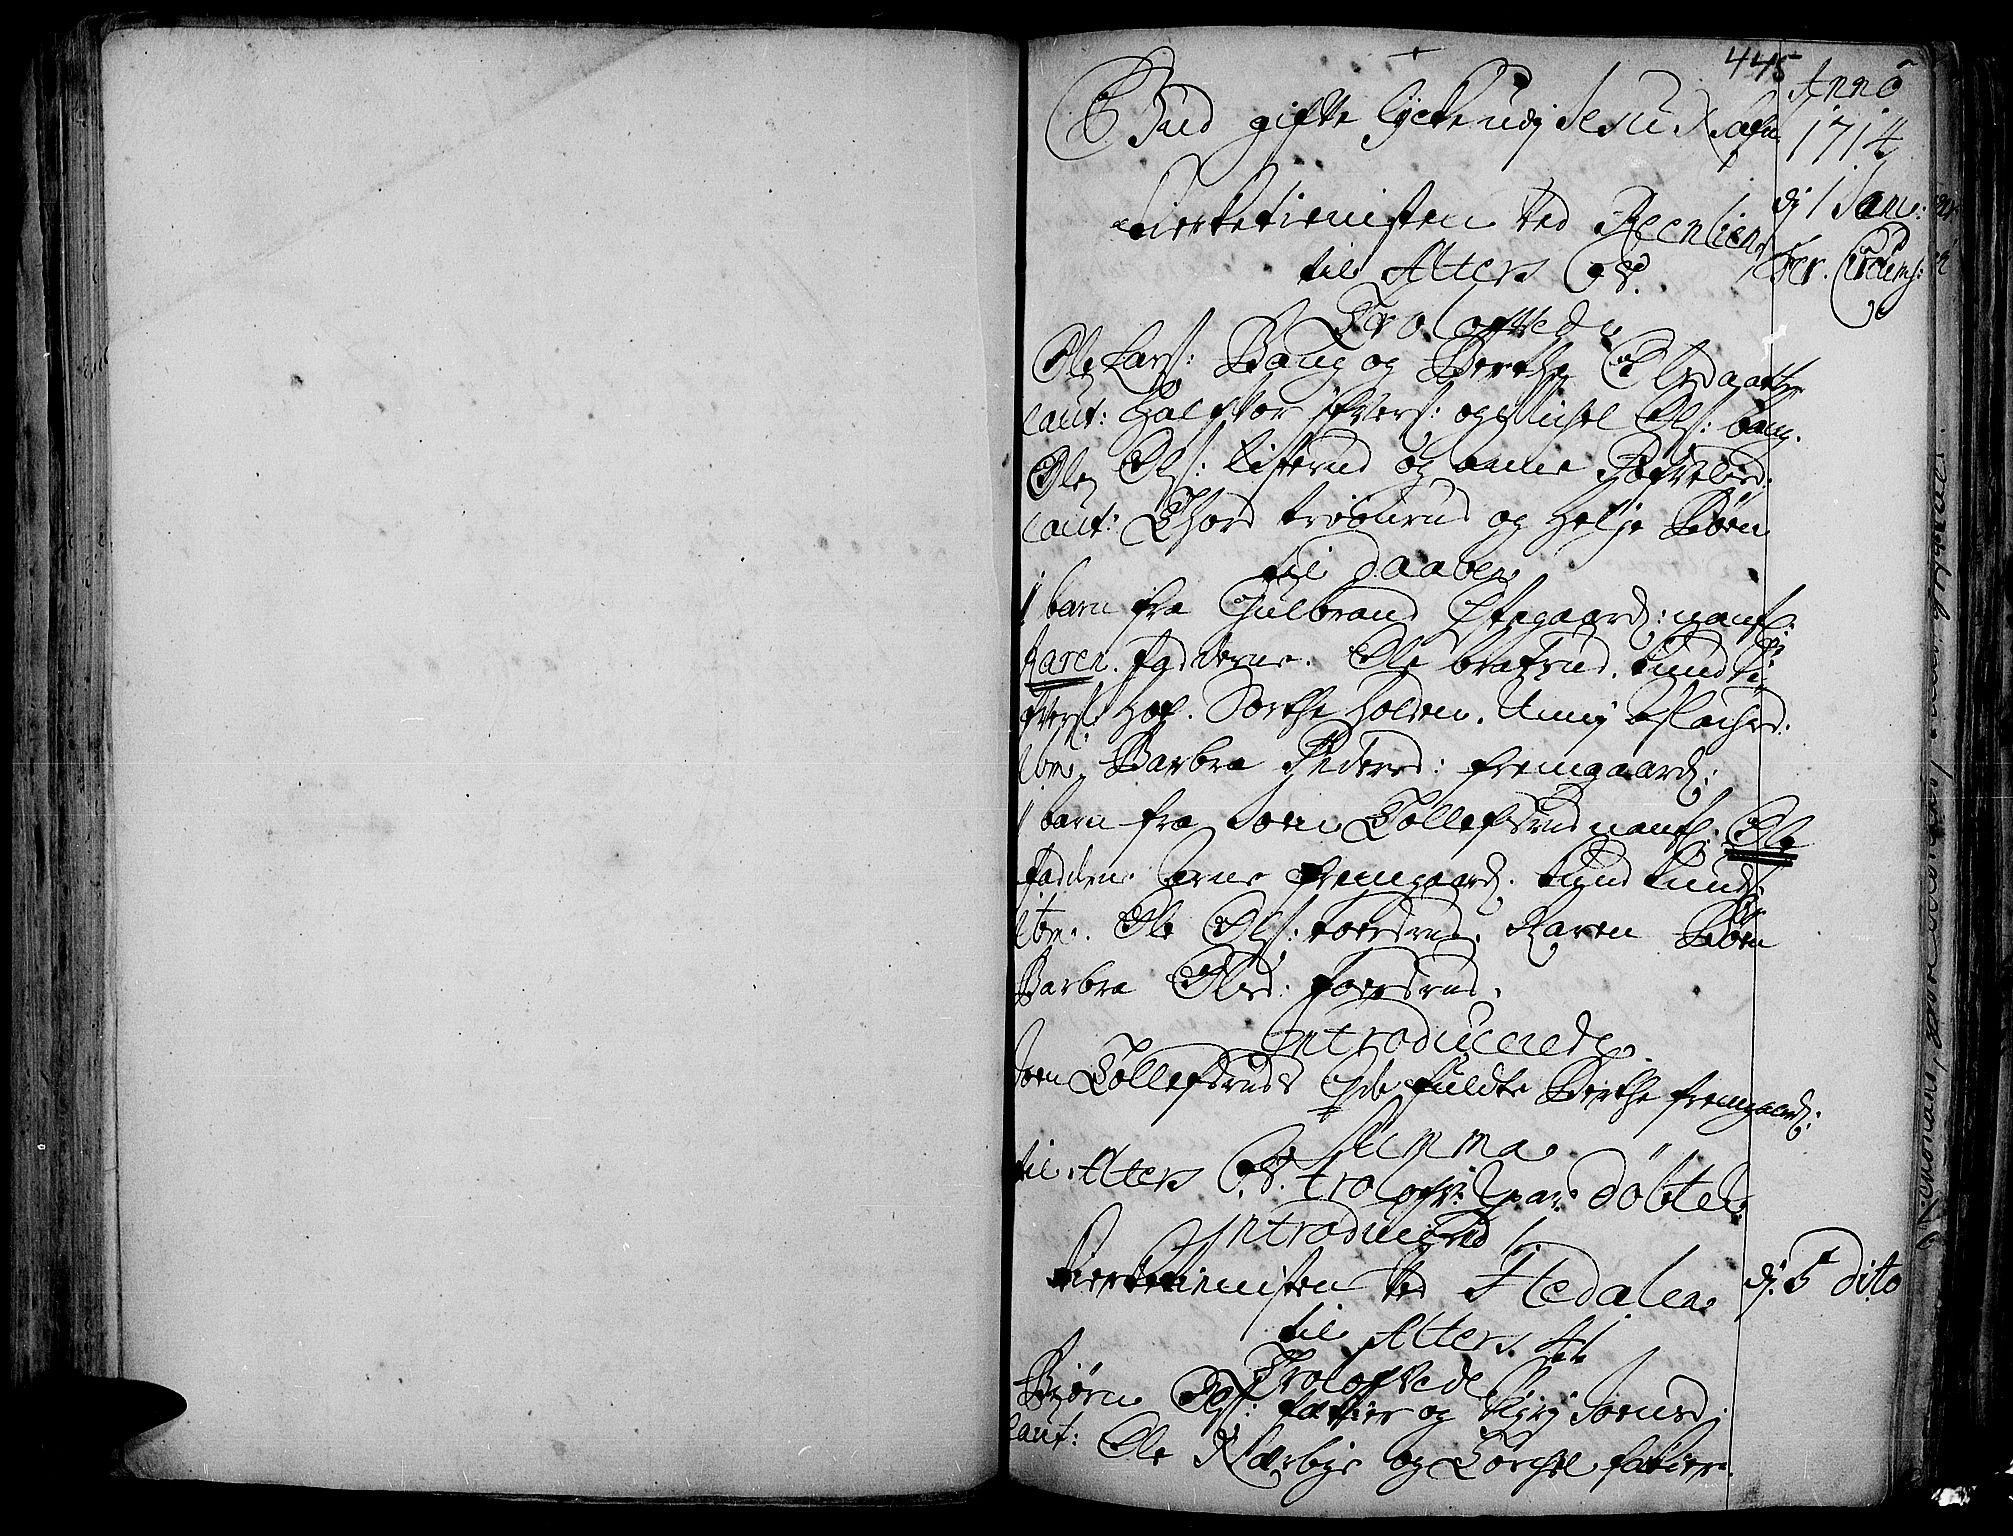 SAH, Aurdal prestekontor, Ministerialbok nr. 1-3, 1692-1730, s. 445